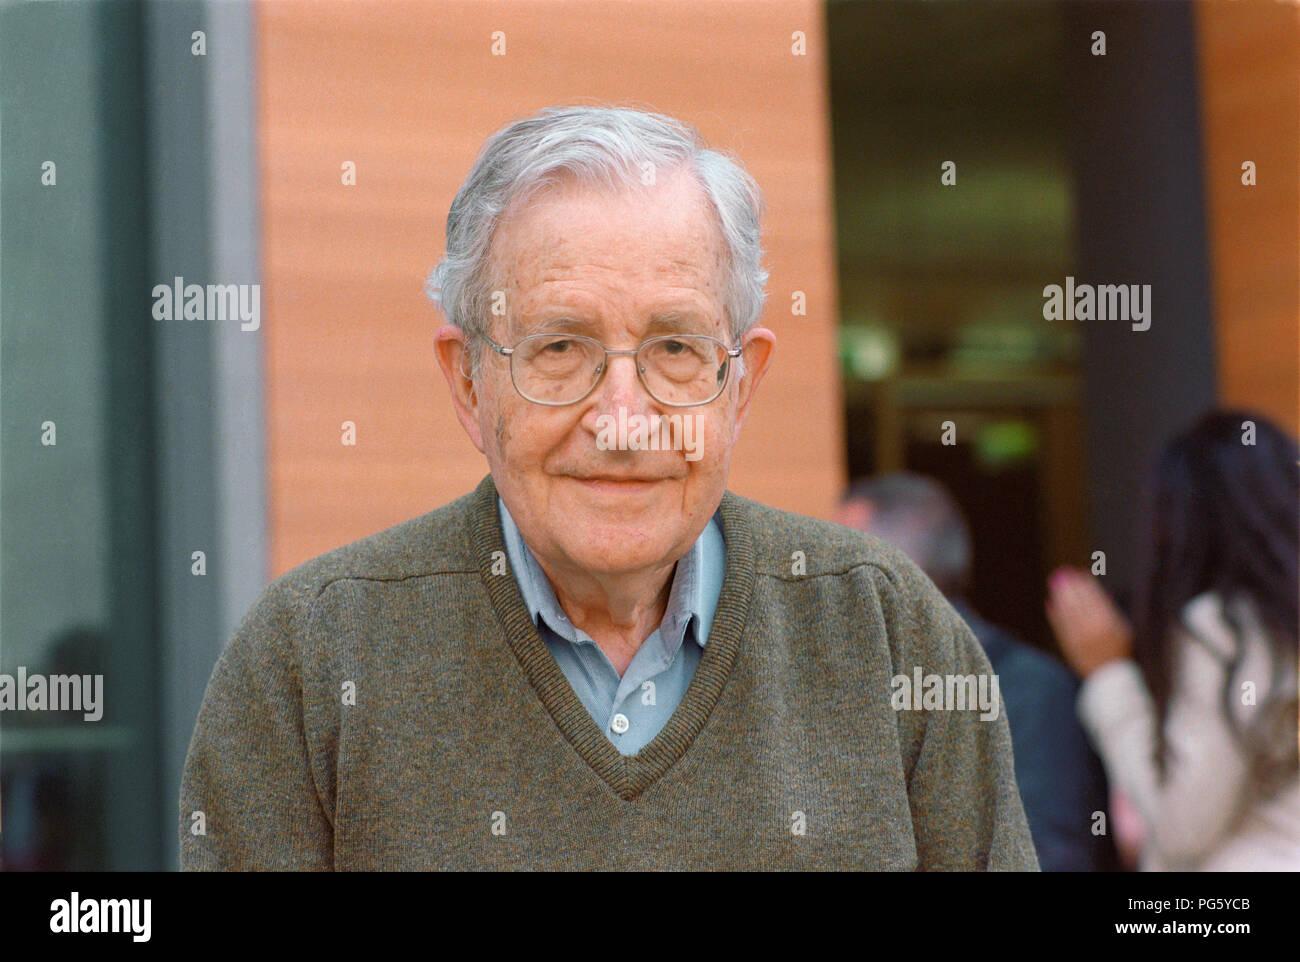 Noam Chomsky (Professor of Linguistics - USA) - 06/08/2011 - Stock Image